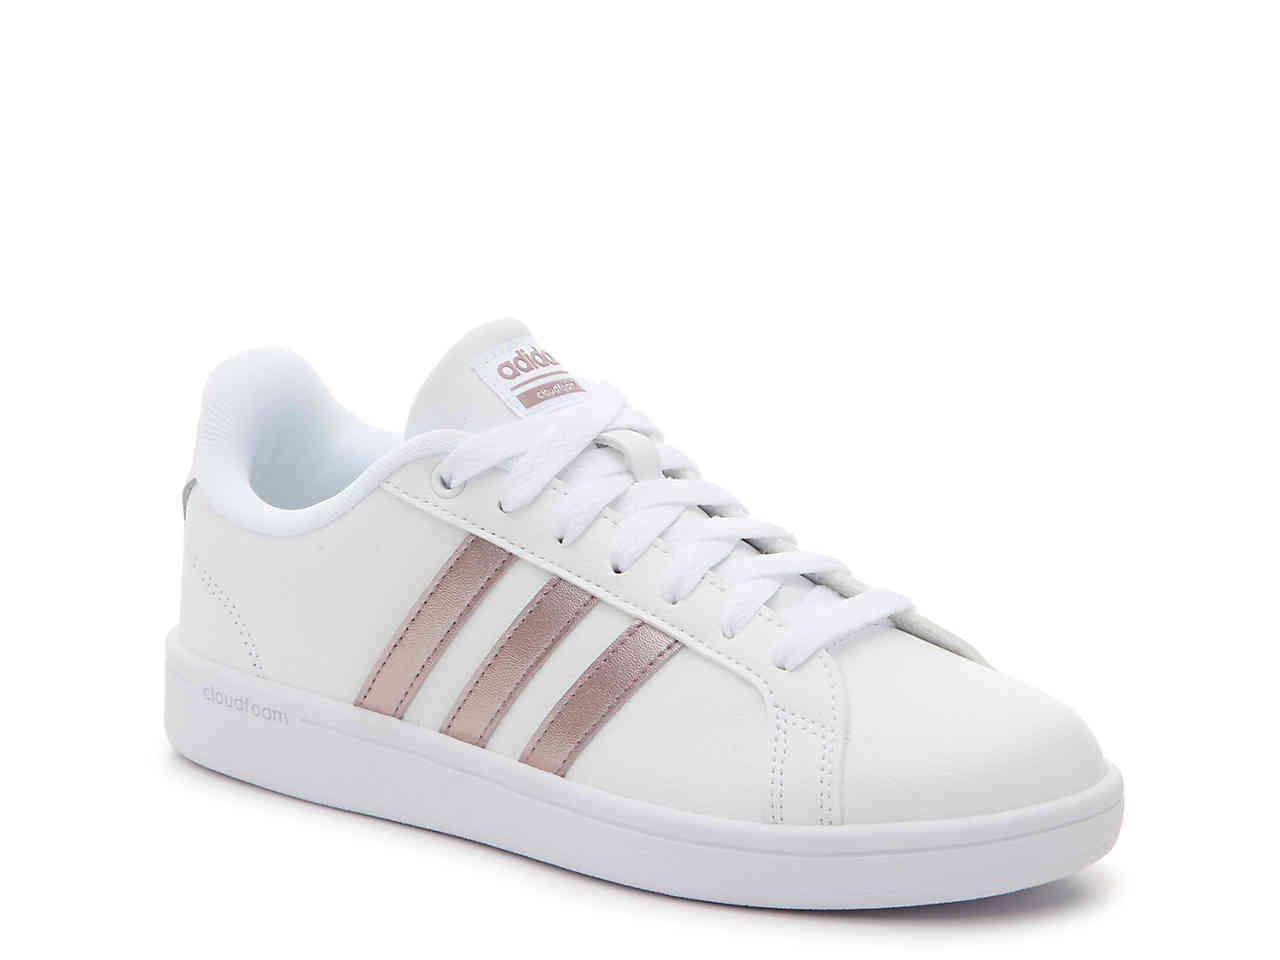 lyst scarpe adidas vantaggio in bianco.